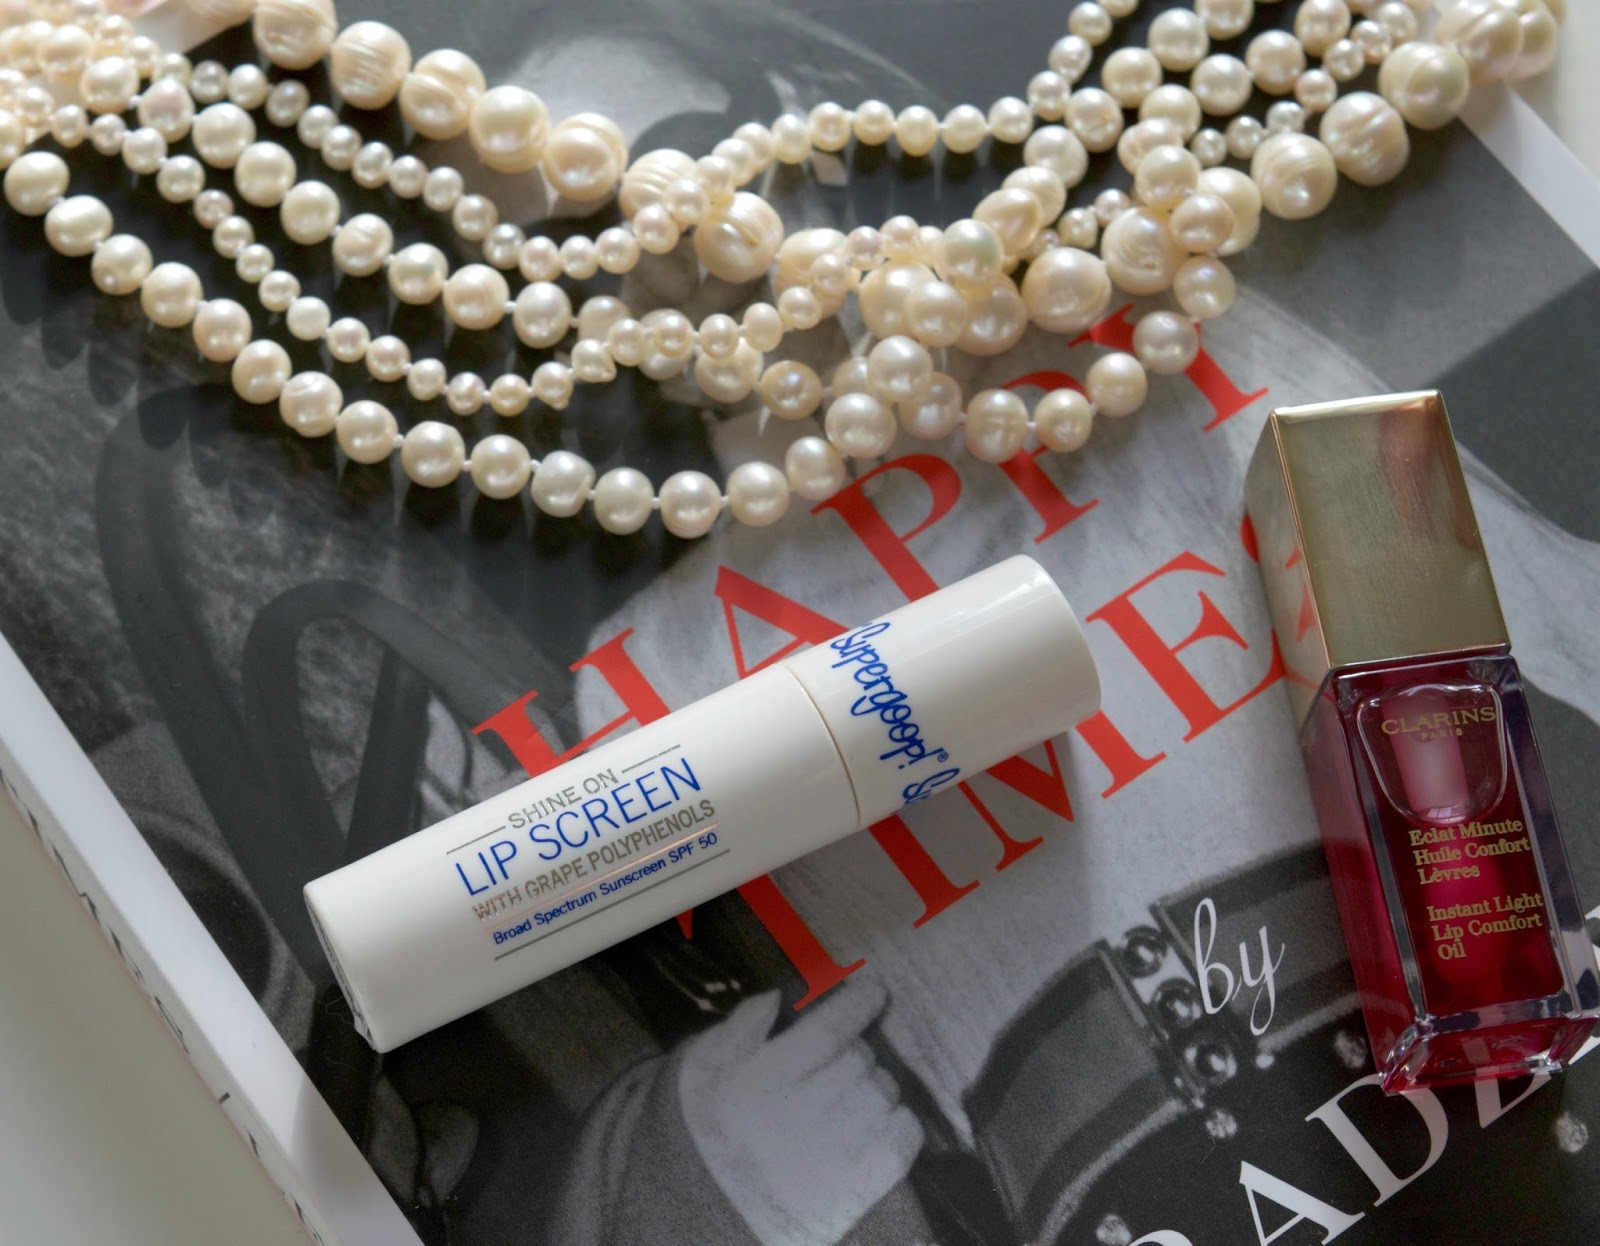 clarins lip gloss - supergoop lip screen